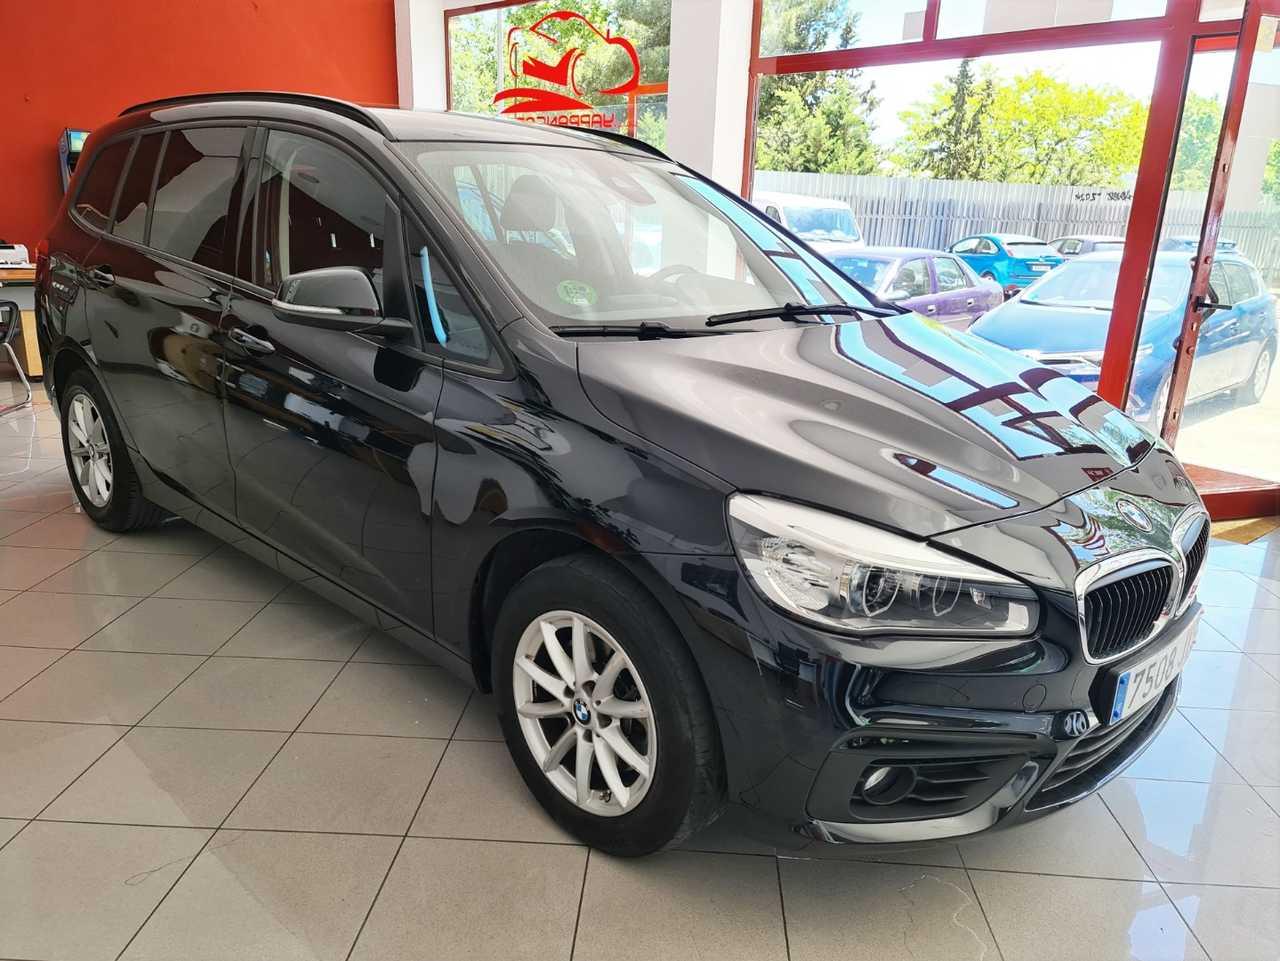 BMW Serie 2 Gran Tourer 218 d 150 CV 7 Plazas   - Foto 1